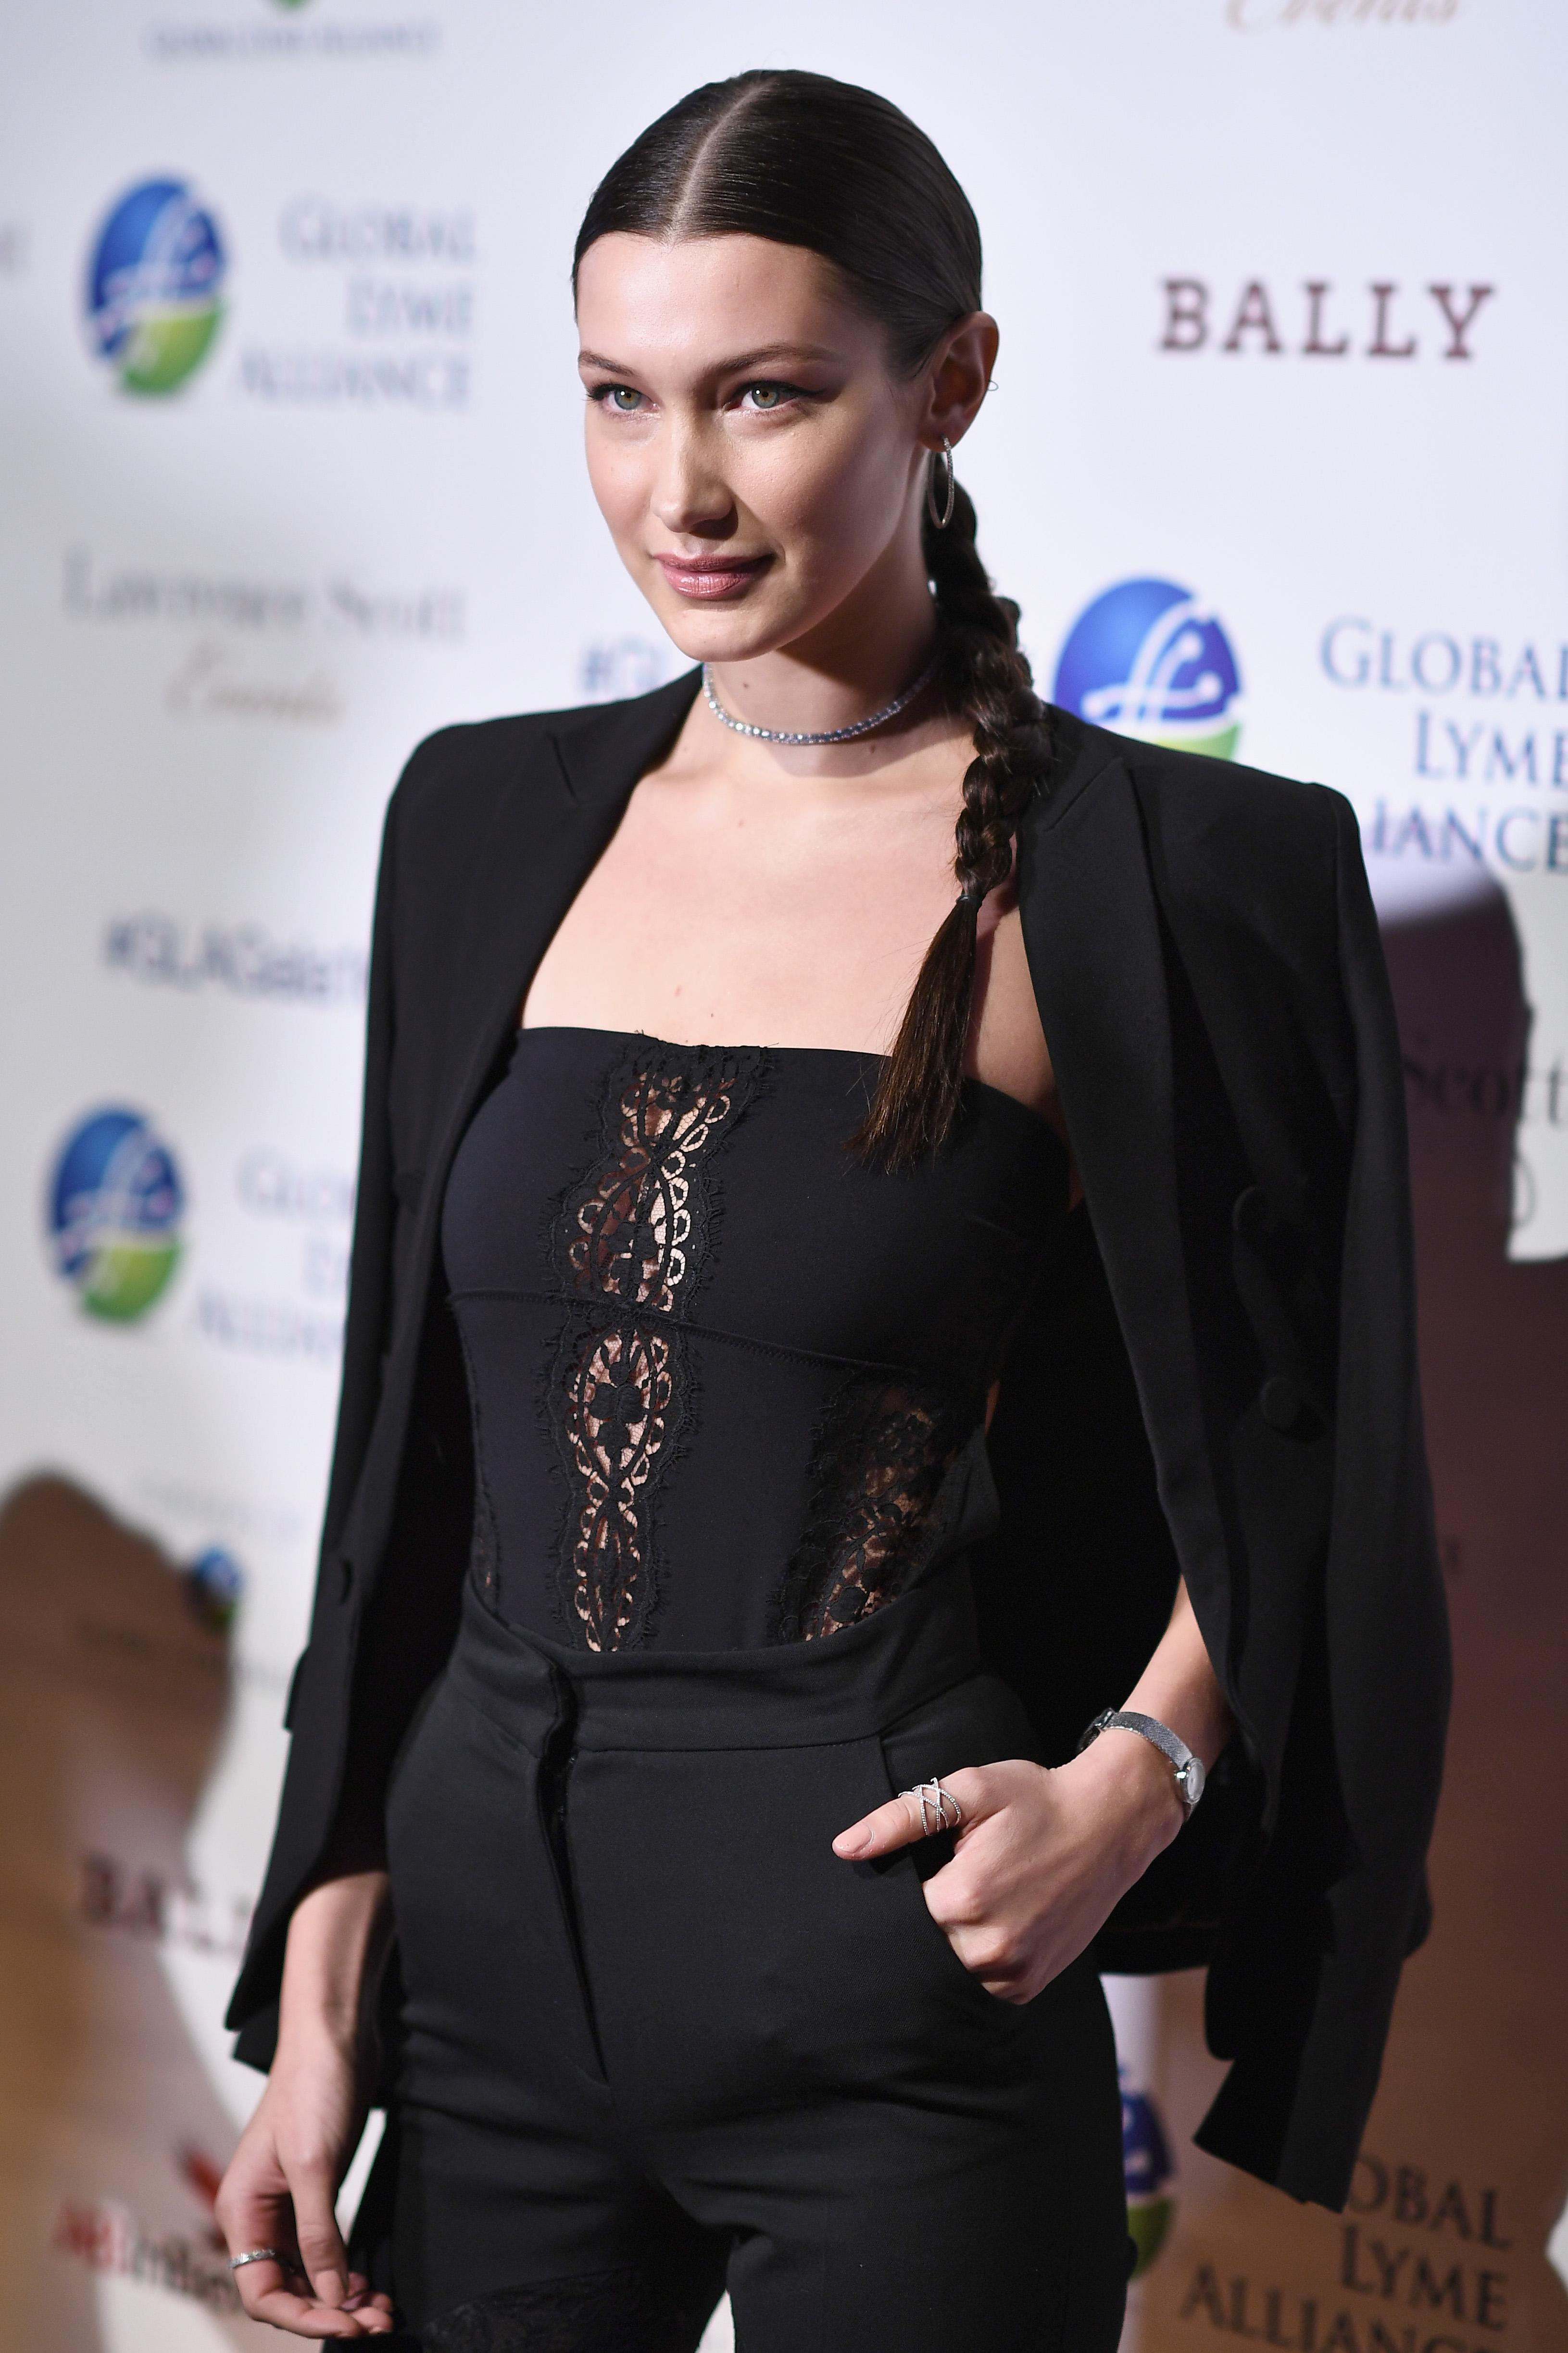 Depois de Gigi, Bella Hadid desfilará para a Victoria's Secret.